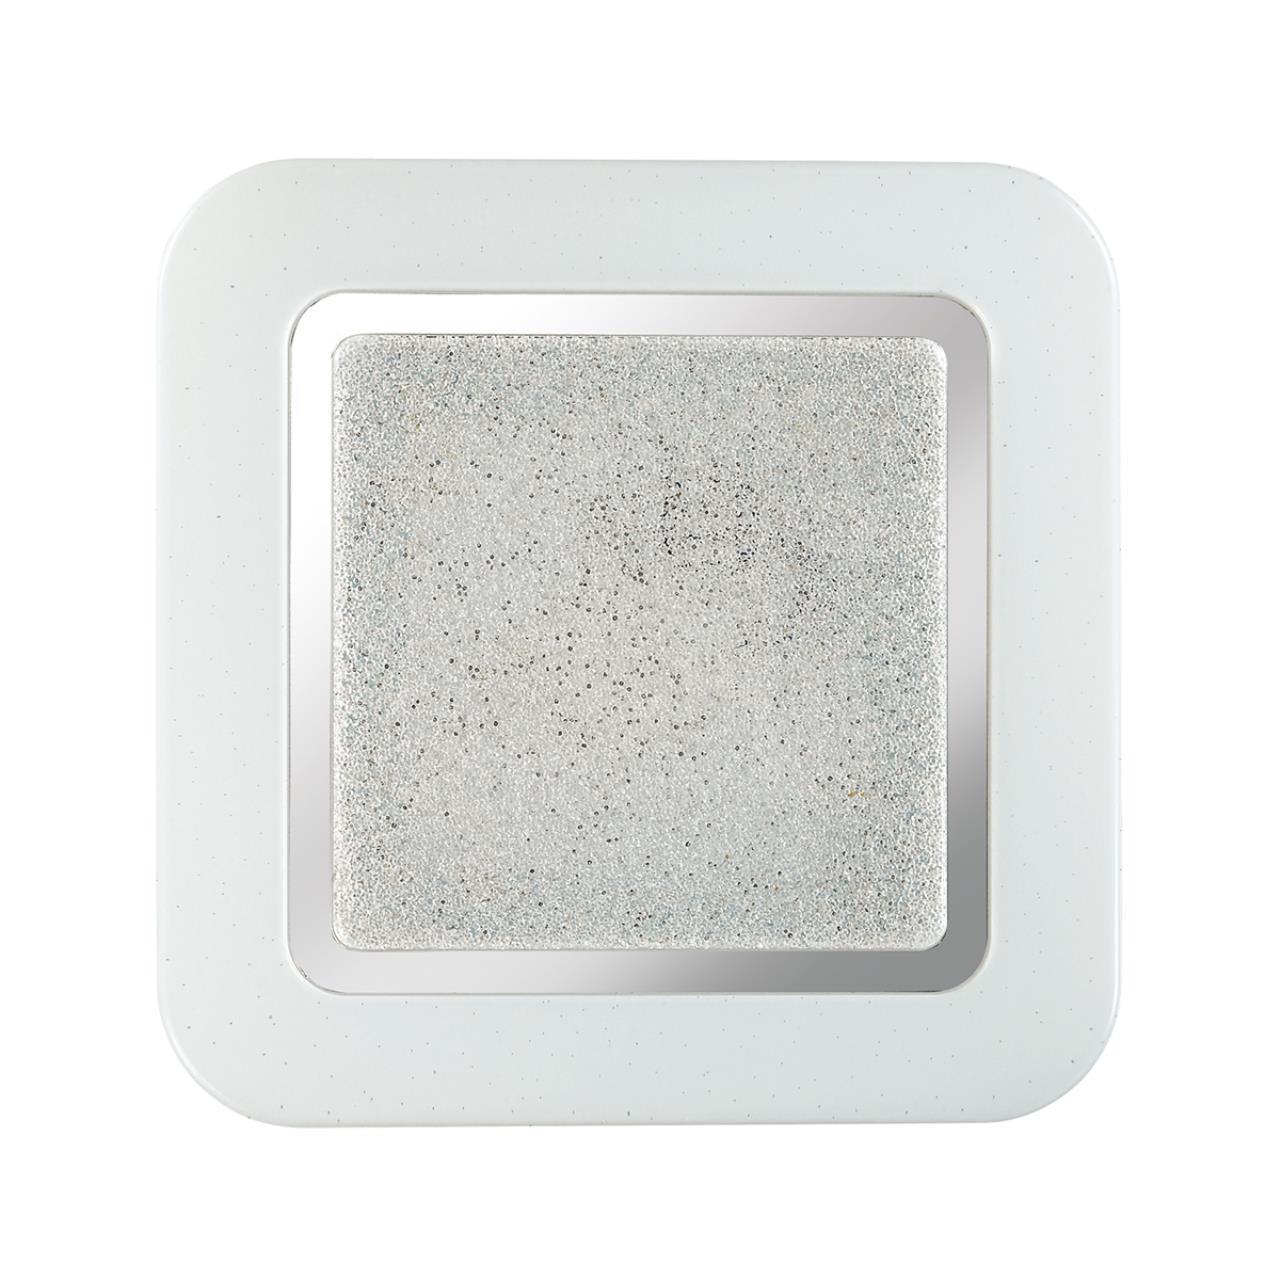 2080/CL SN 013 св-к PINO пластик LED 30Вт 4000К 330*330 IP43